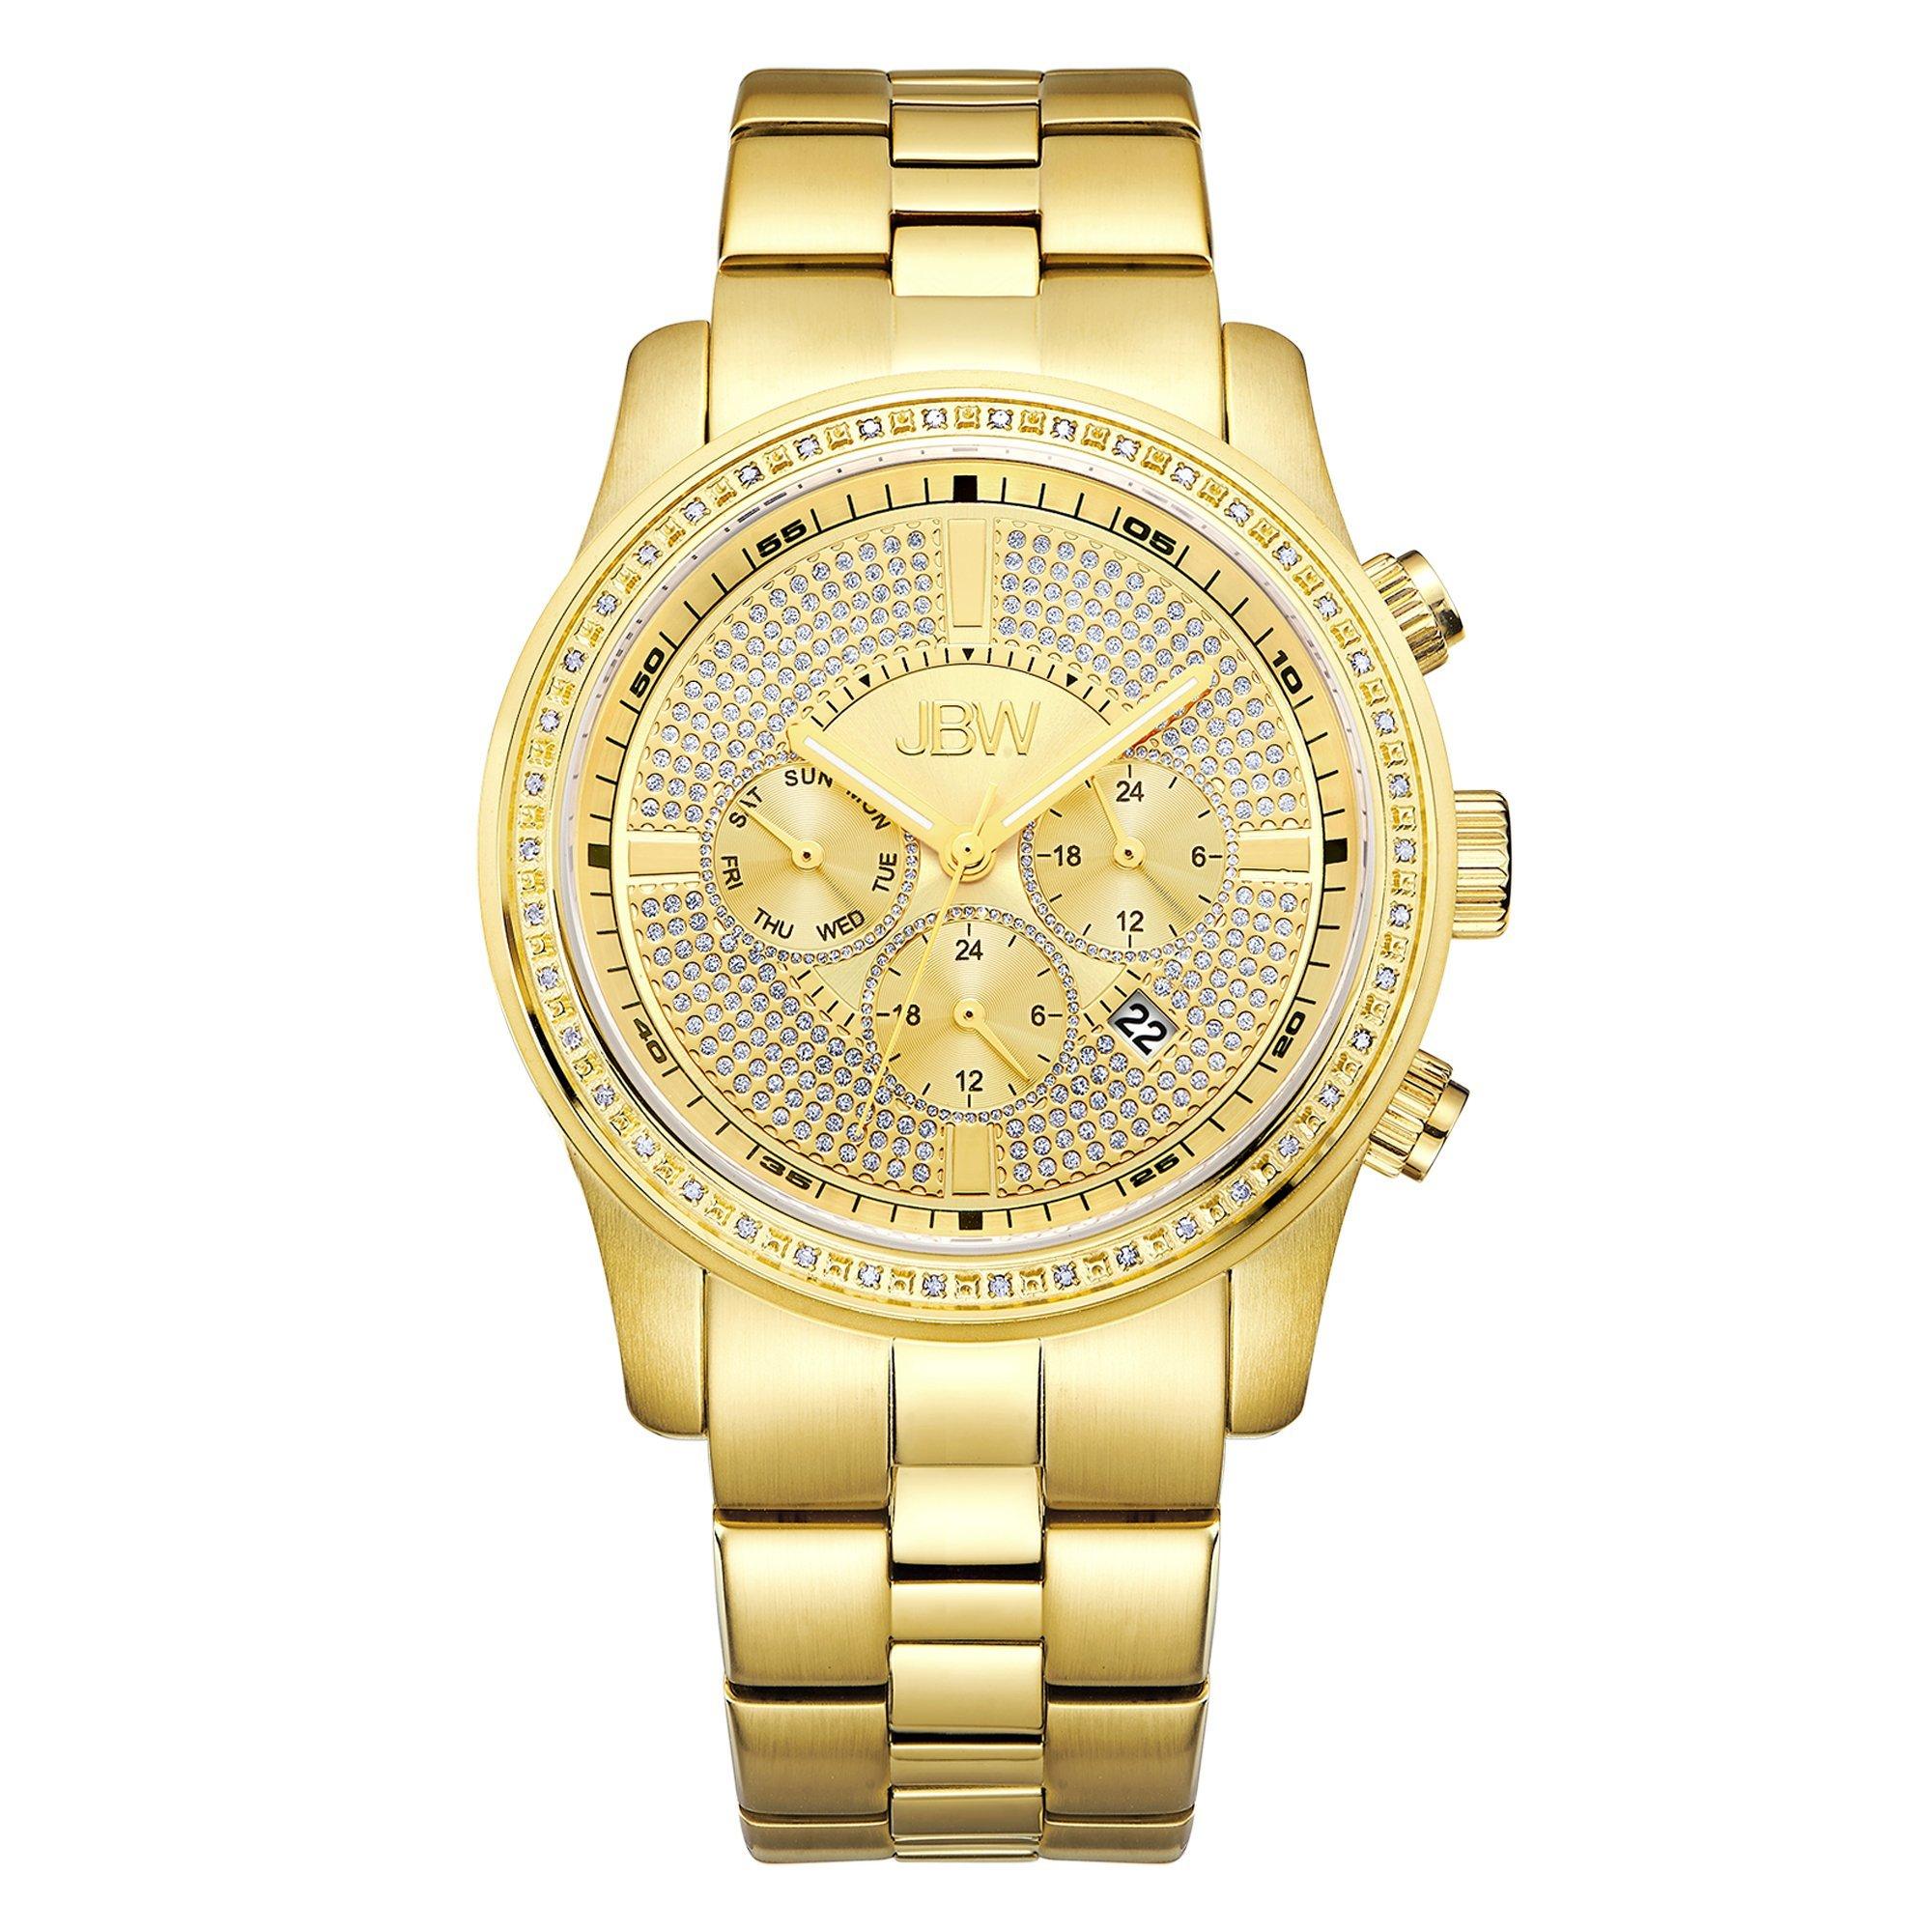 Jbw Men's Vanquish J6337B Chronograph Diamond Watch 6